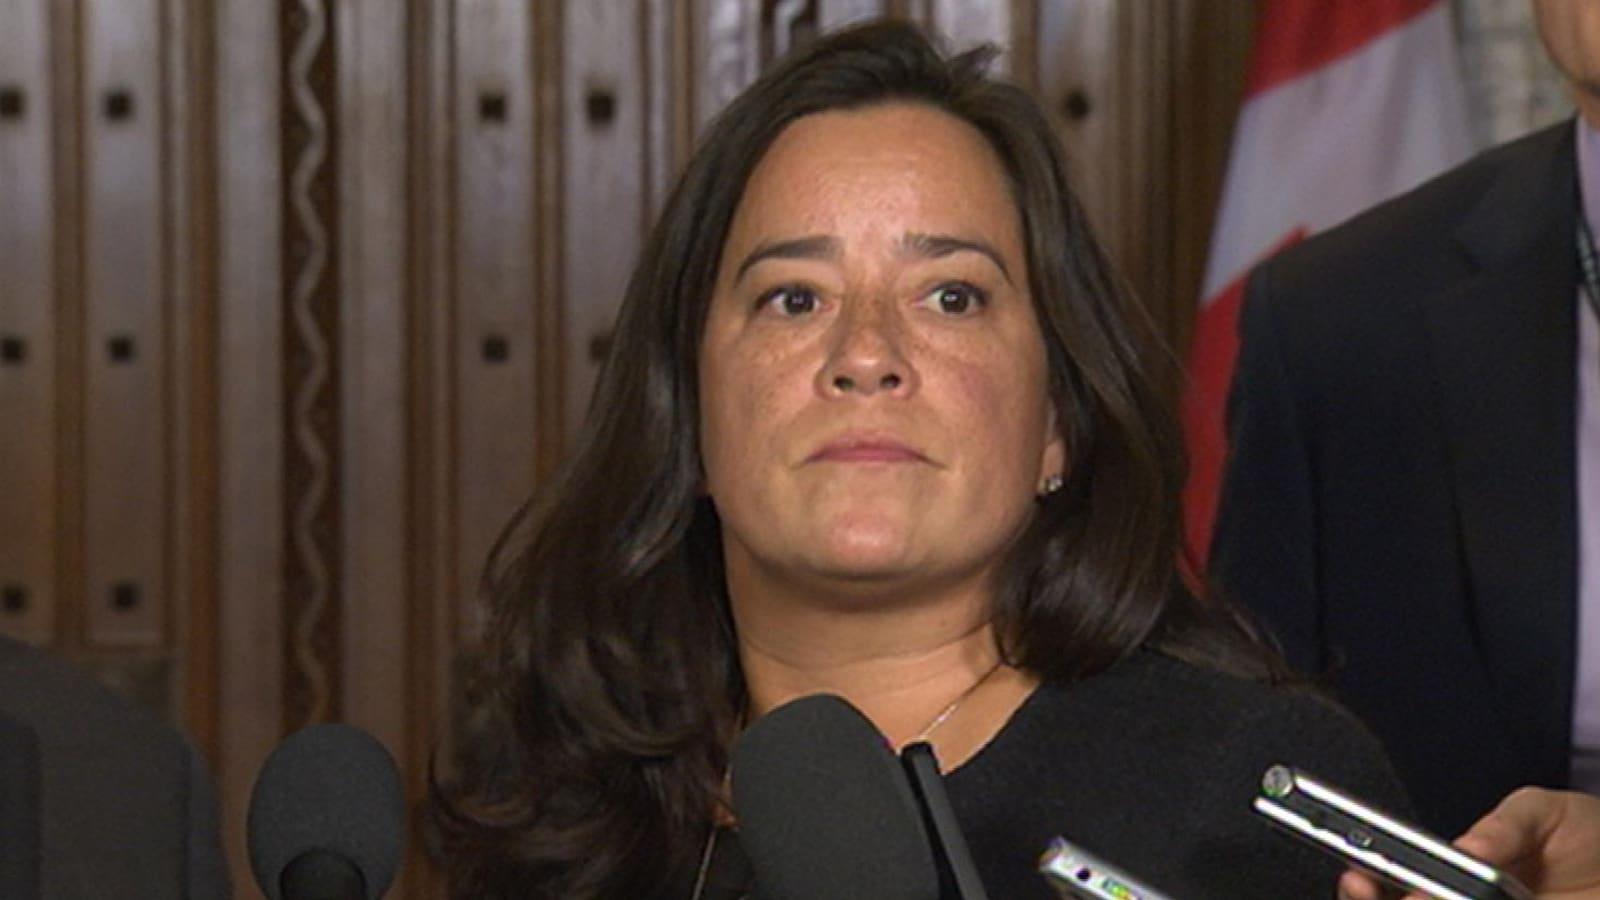 La ministre fédérale de la Justice, Jody Wilson-Raybould.